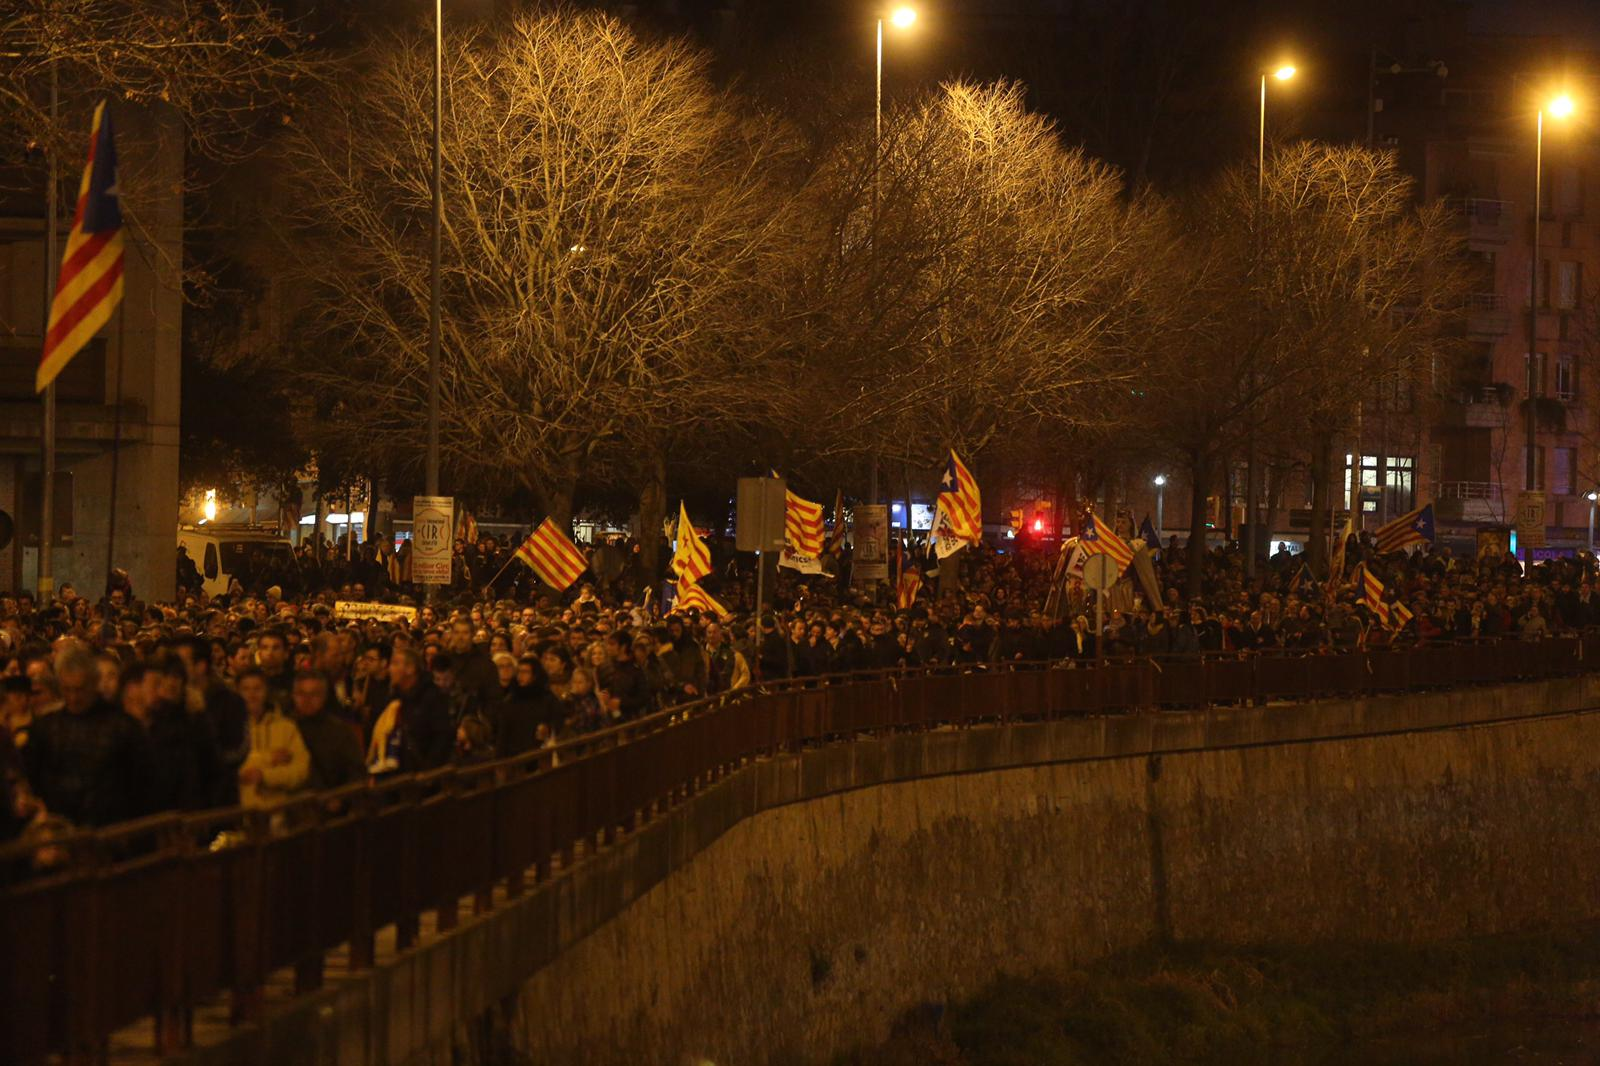 Manifestacio girona Vaga General - Carles Palacio